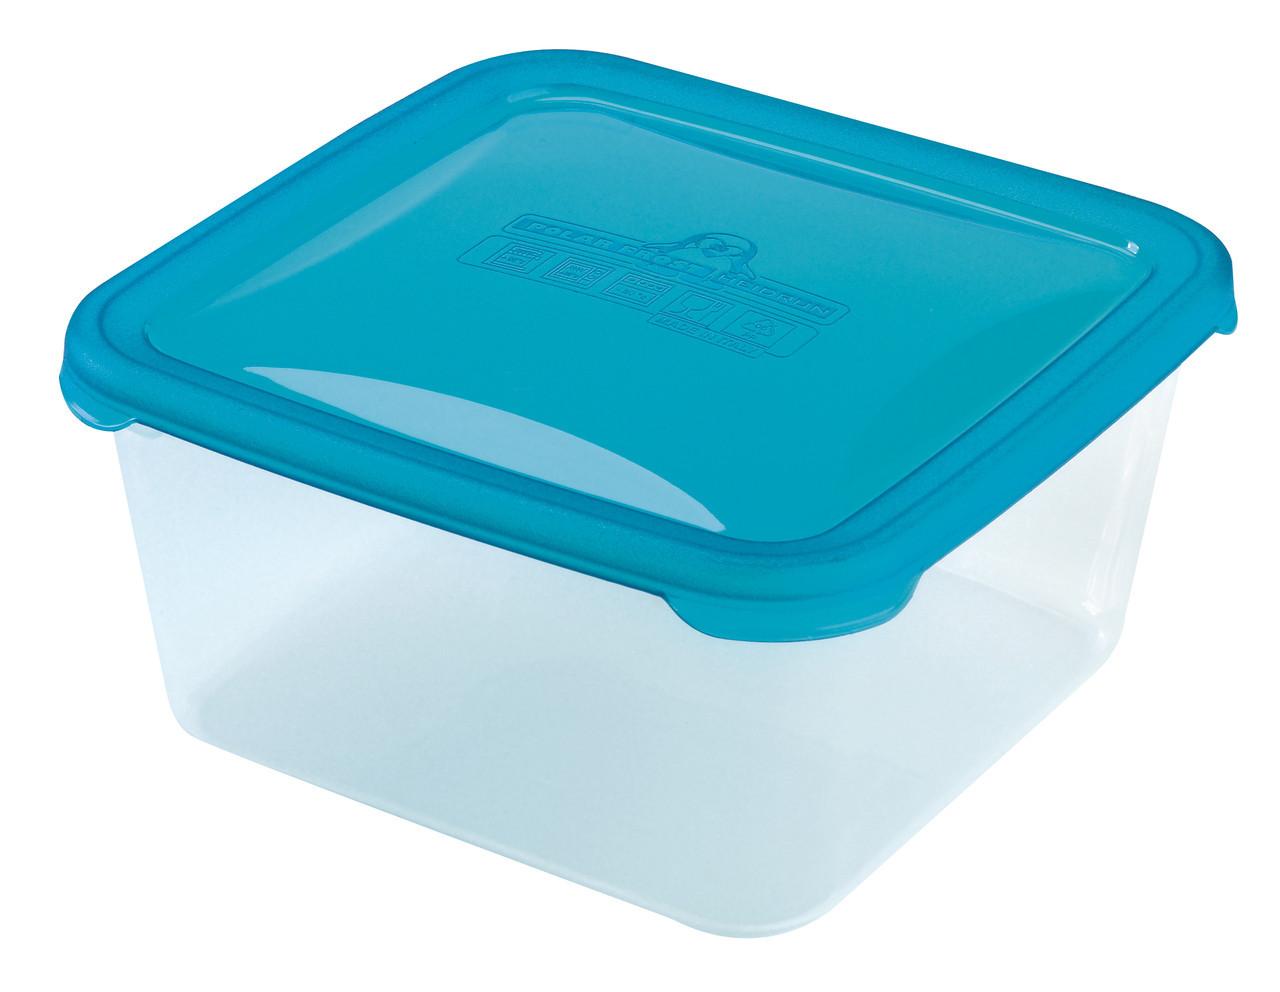 Контейнер для хранения в морозилке 2,4л Heidrun PolarFrost 19,5*19.5*9,1см (HDR-1765)